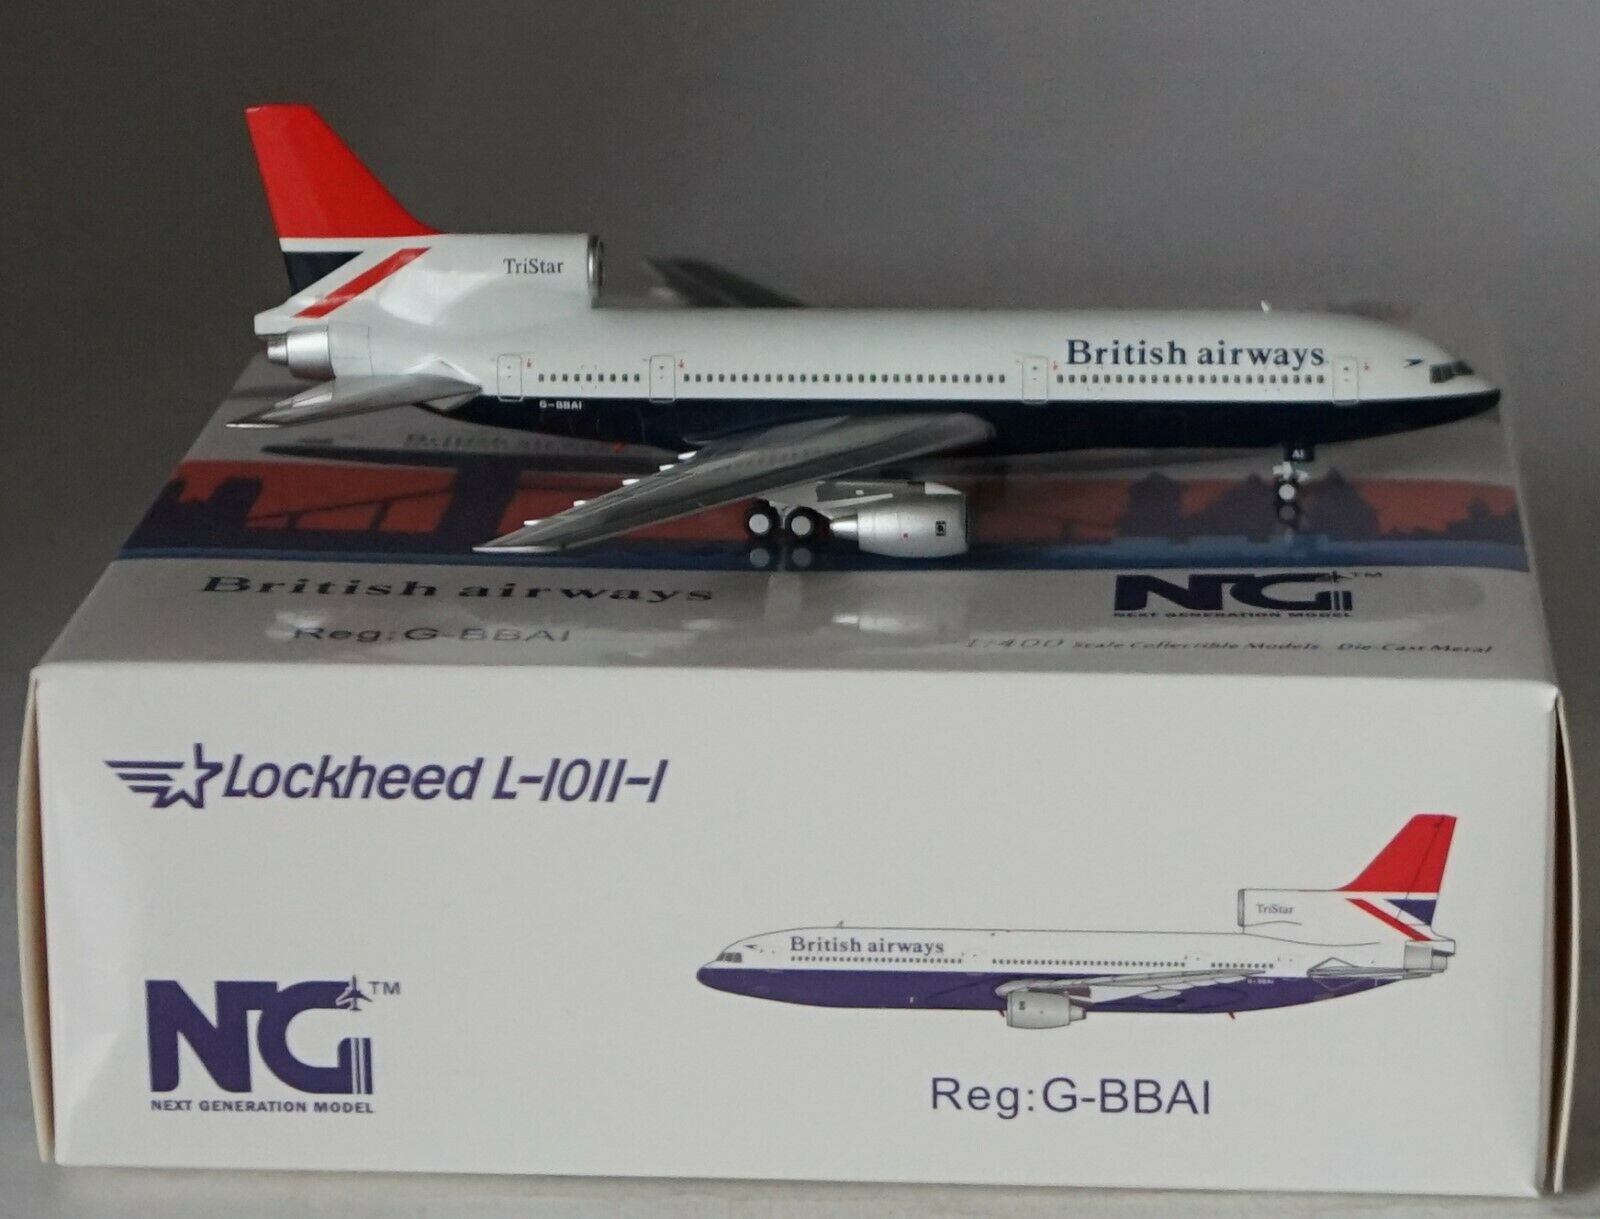 NG Modele 31008 Lockheed L-1011-100 British Airways G-Bbai in 1 400 Maßstab